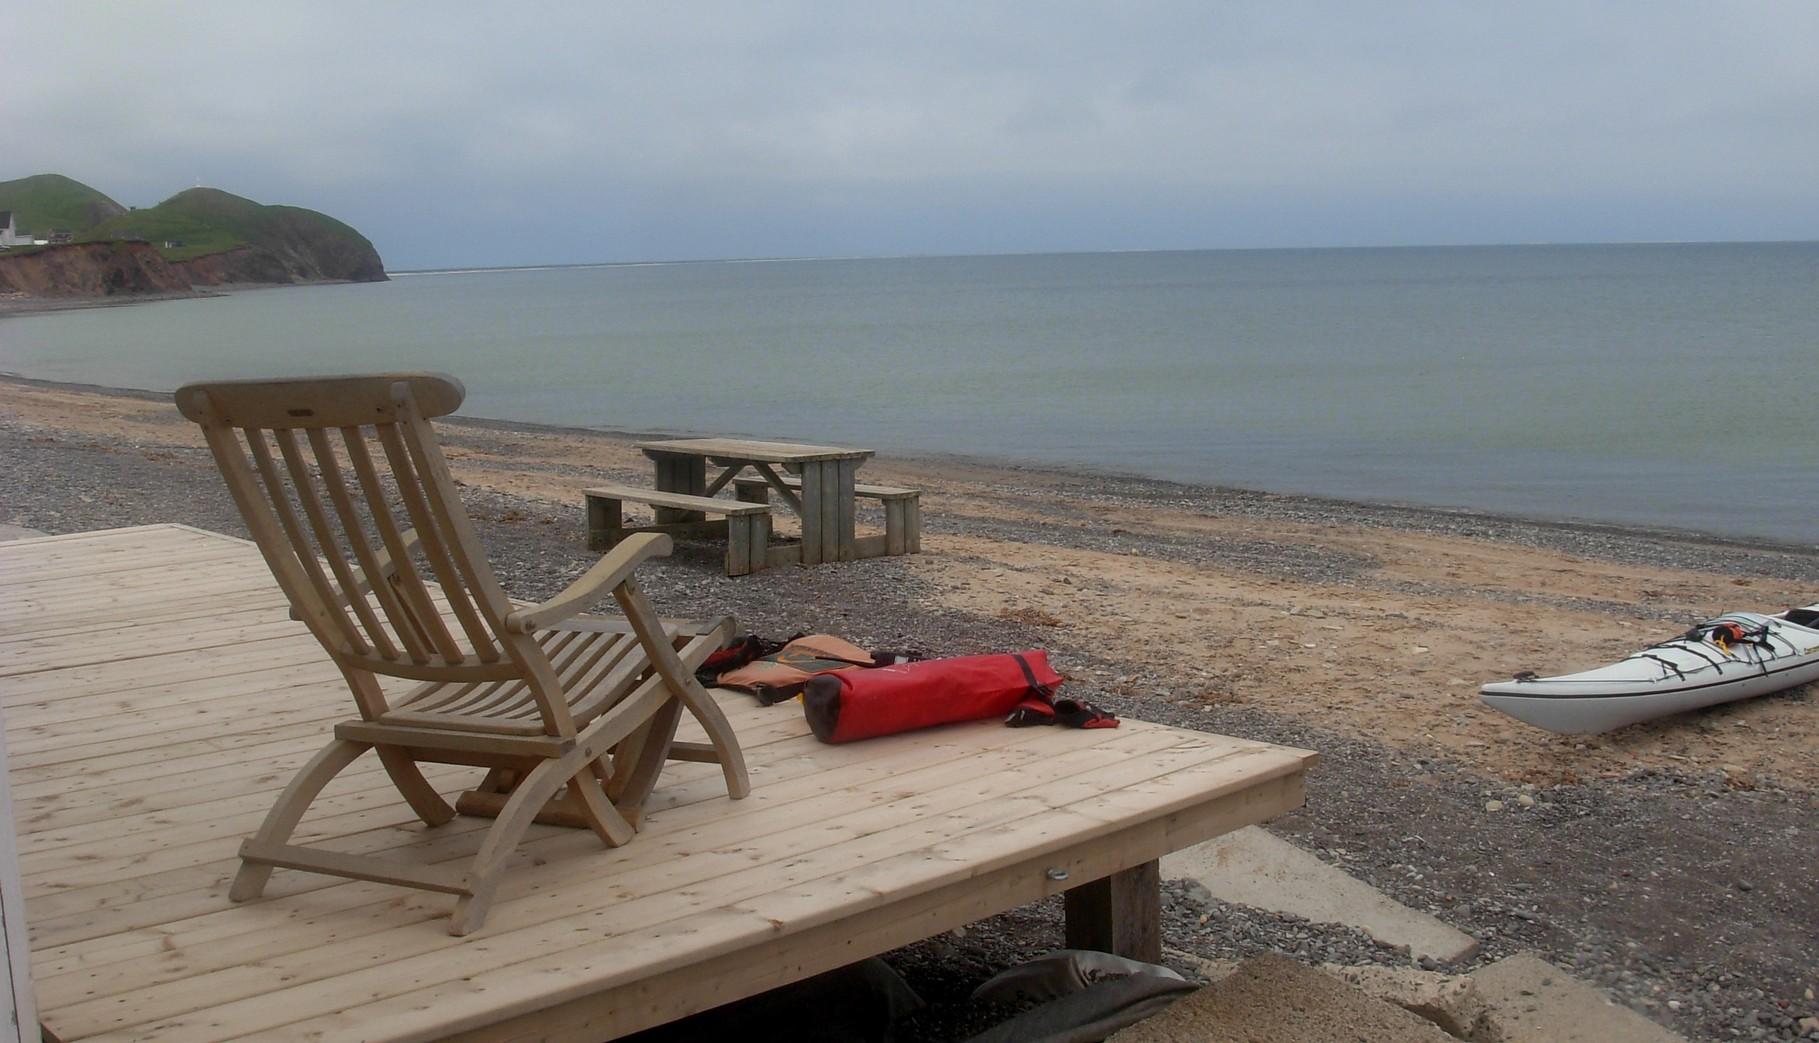 Vers Havre aubert, une terrasse qui tend les bras au pagayeur marin